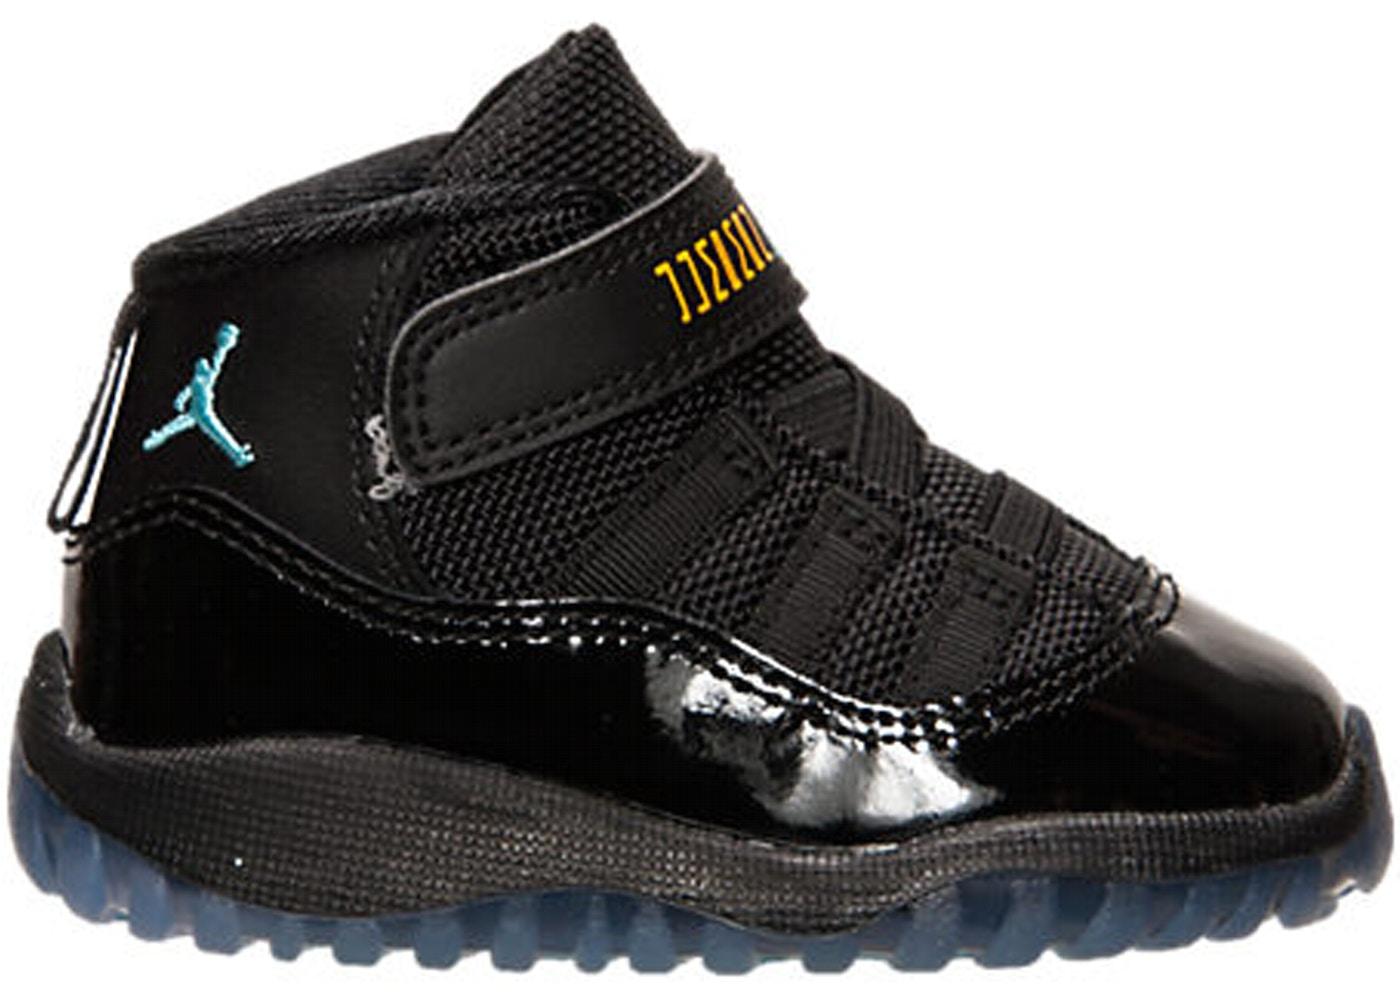 finest selection 333b7 9e29c Buy Air Jordan 11 Size 4 Shoes   Deadstock Sneakers